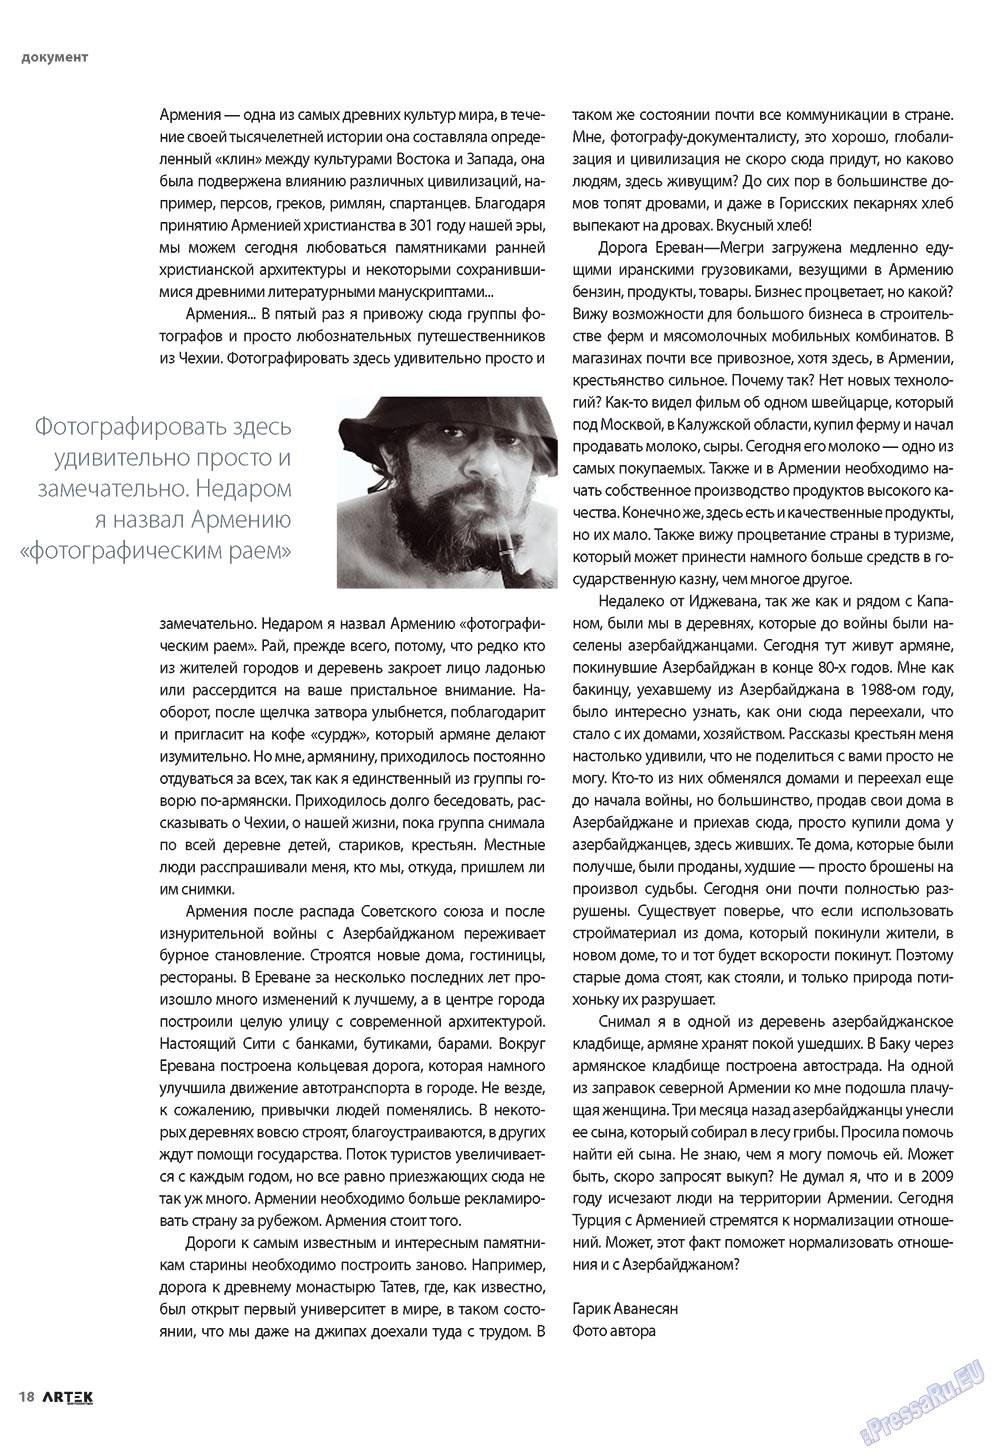 Артек (журнал). 2009 год, номер 5, стр. 18